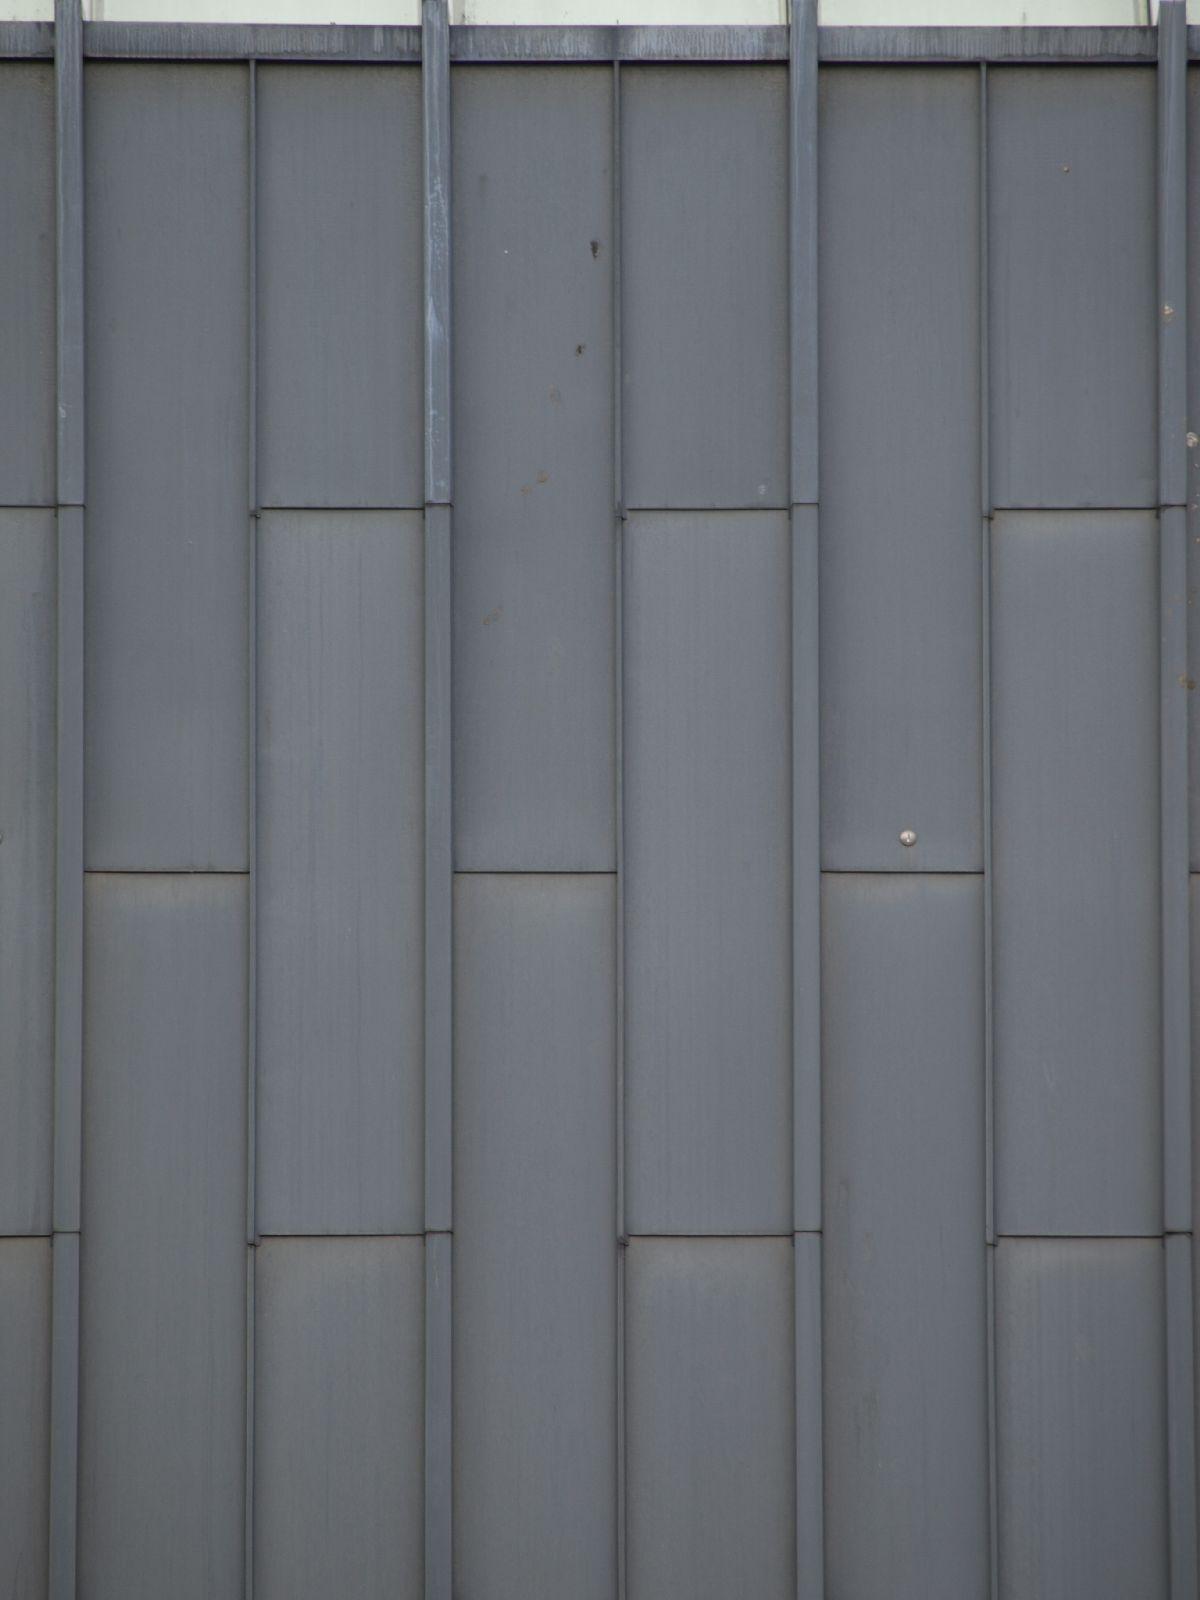 Metall_Textur_A_P6218267